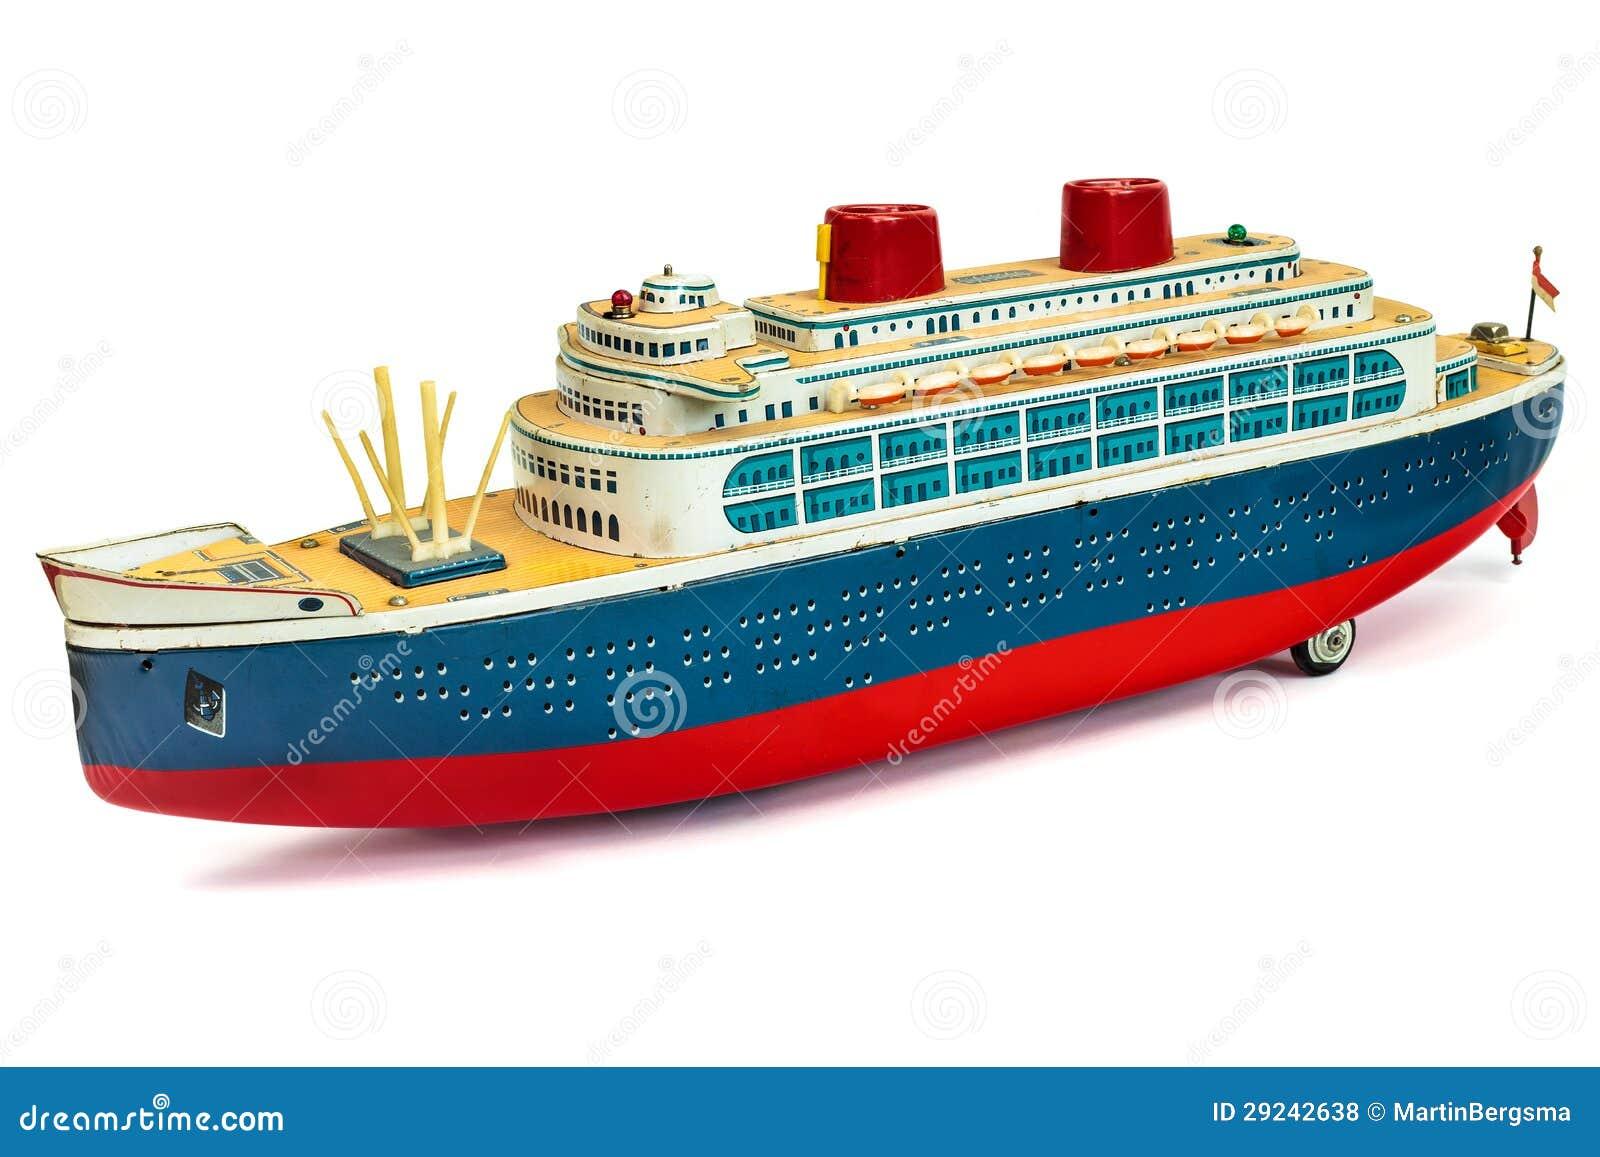 Antique Toy Cruise Ship On White Royalty Free Stock Photos - Image: 29242638